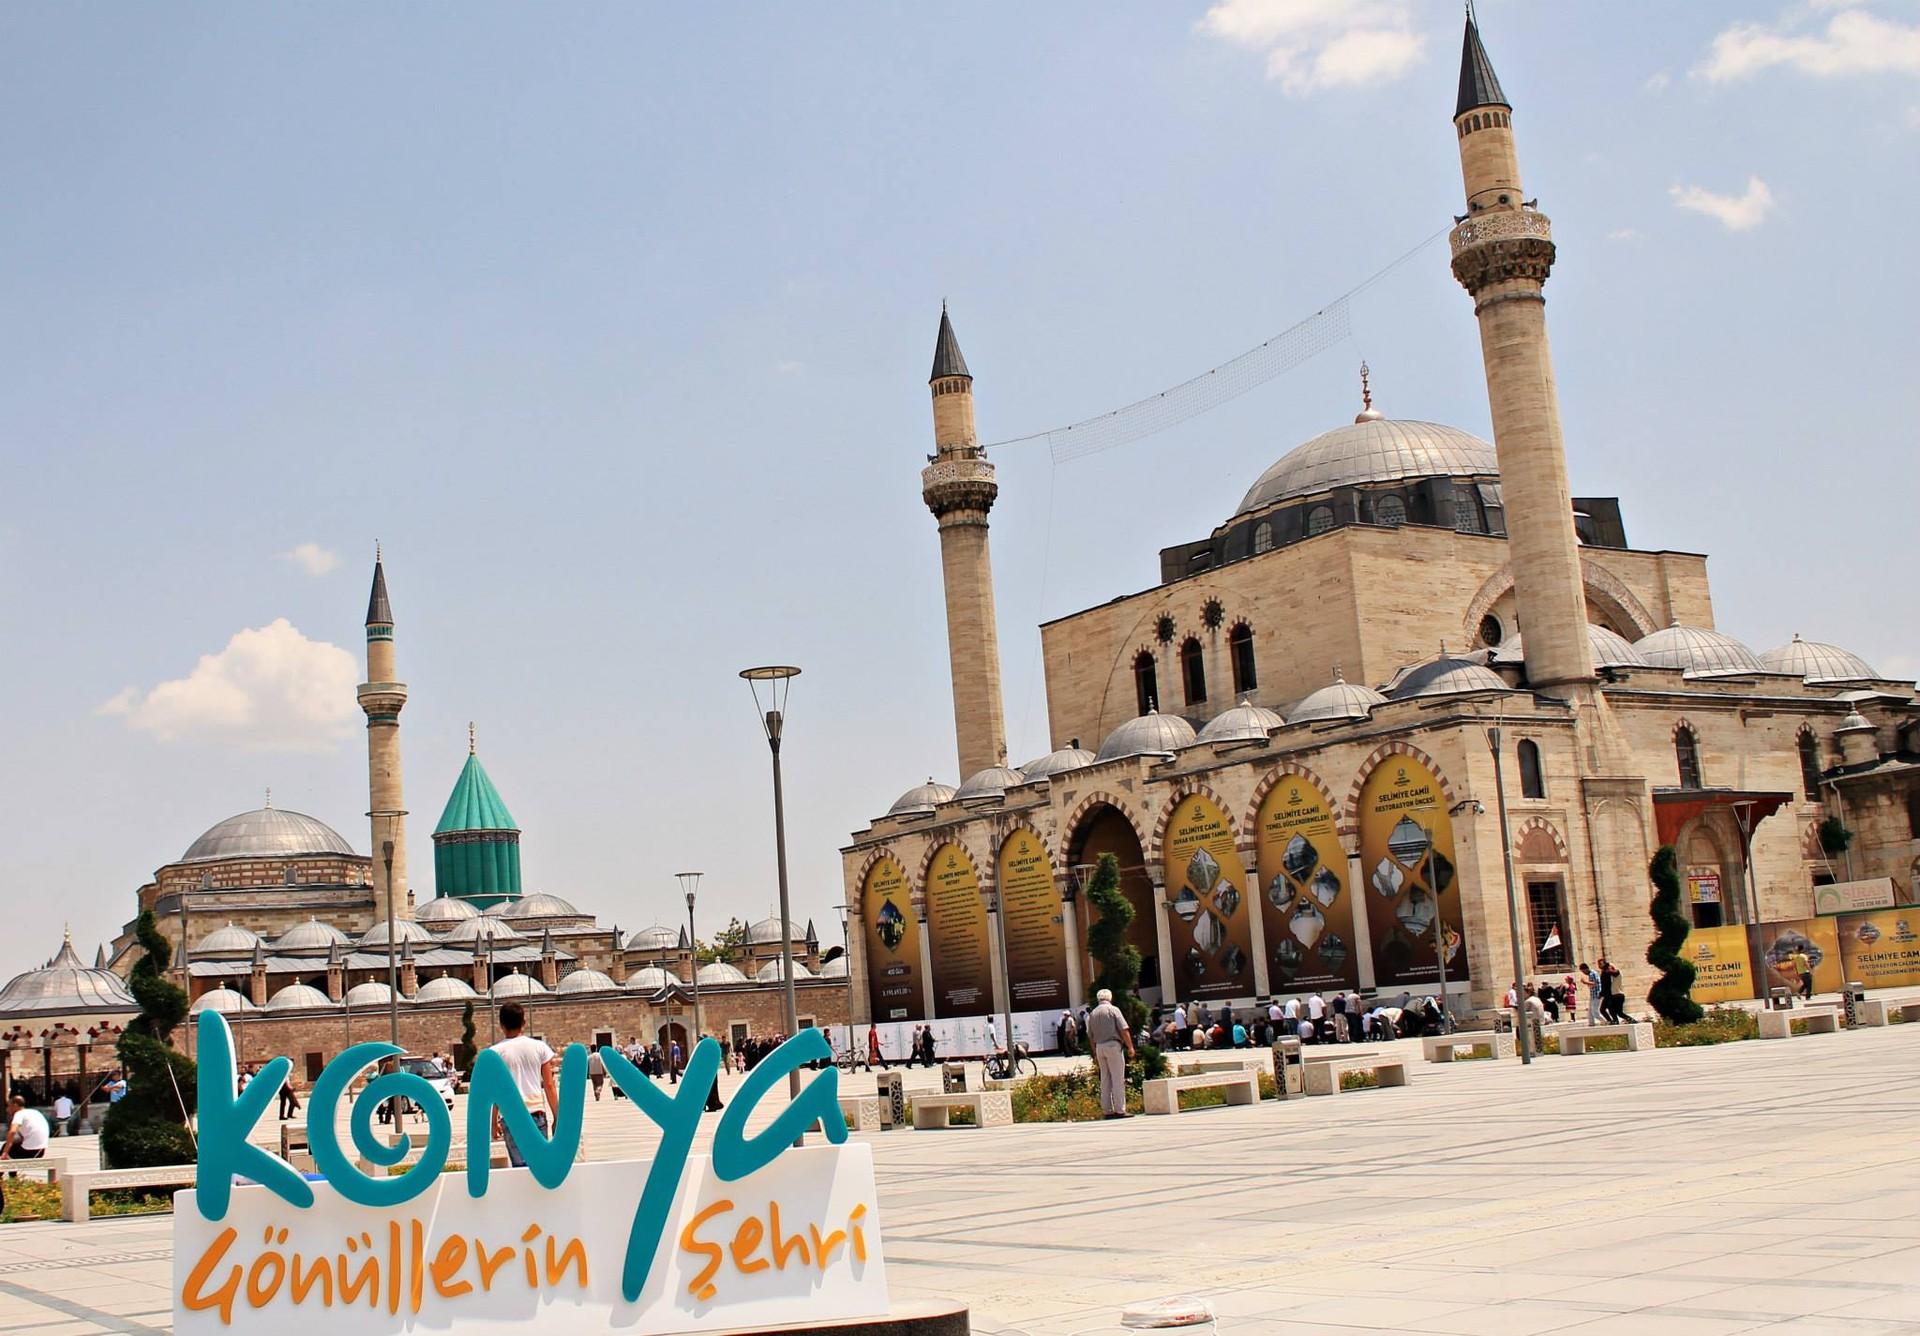 day-trip-konya-turkey-4944b06de9f278c157